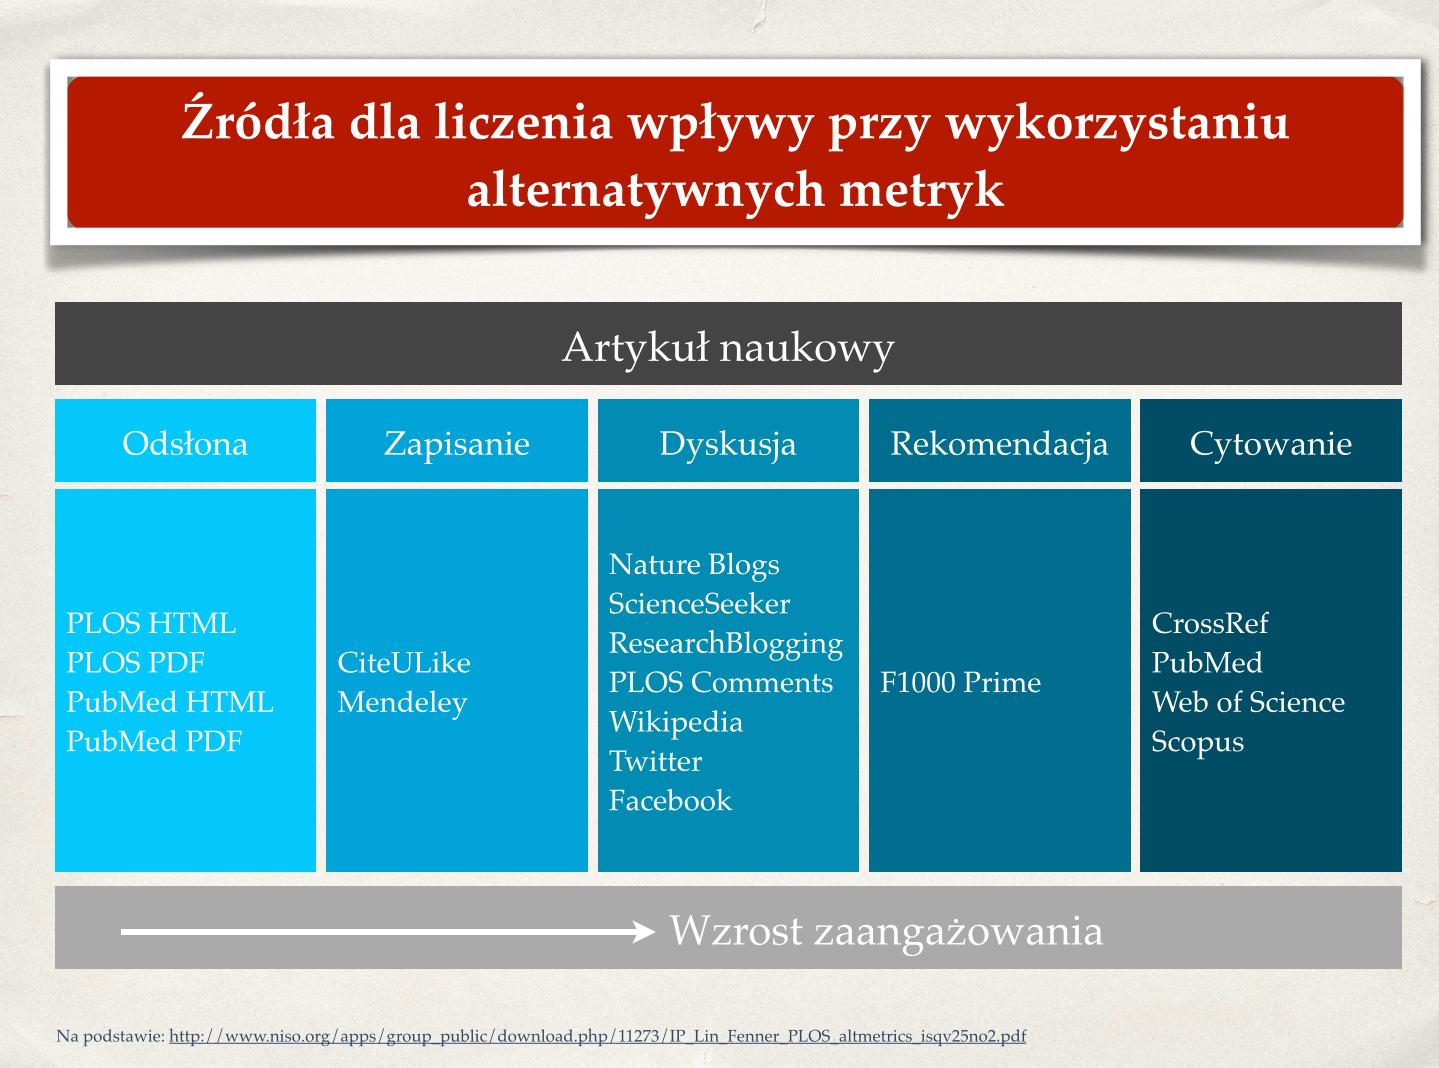 Zrzut ekranu 2013-11-05 06.47.49